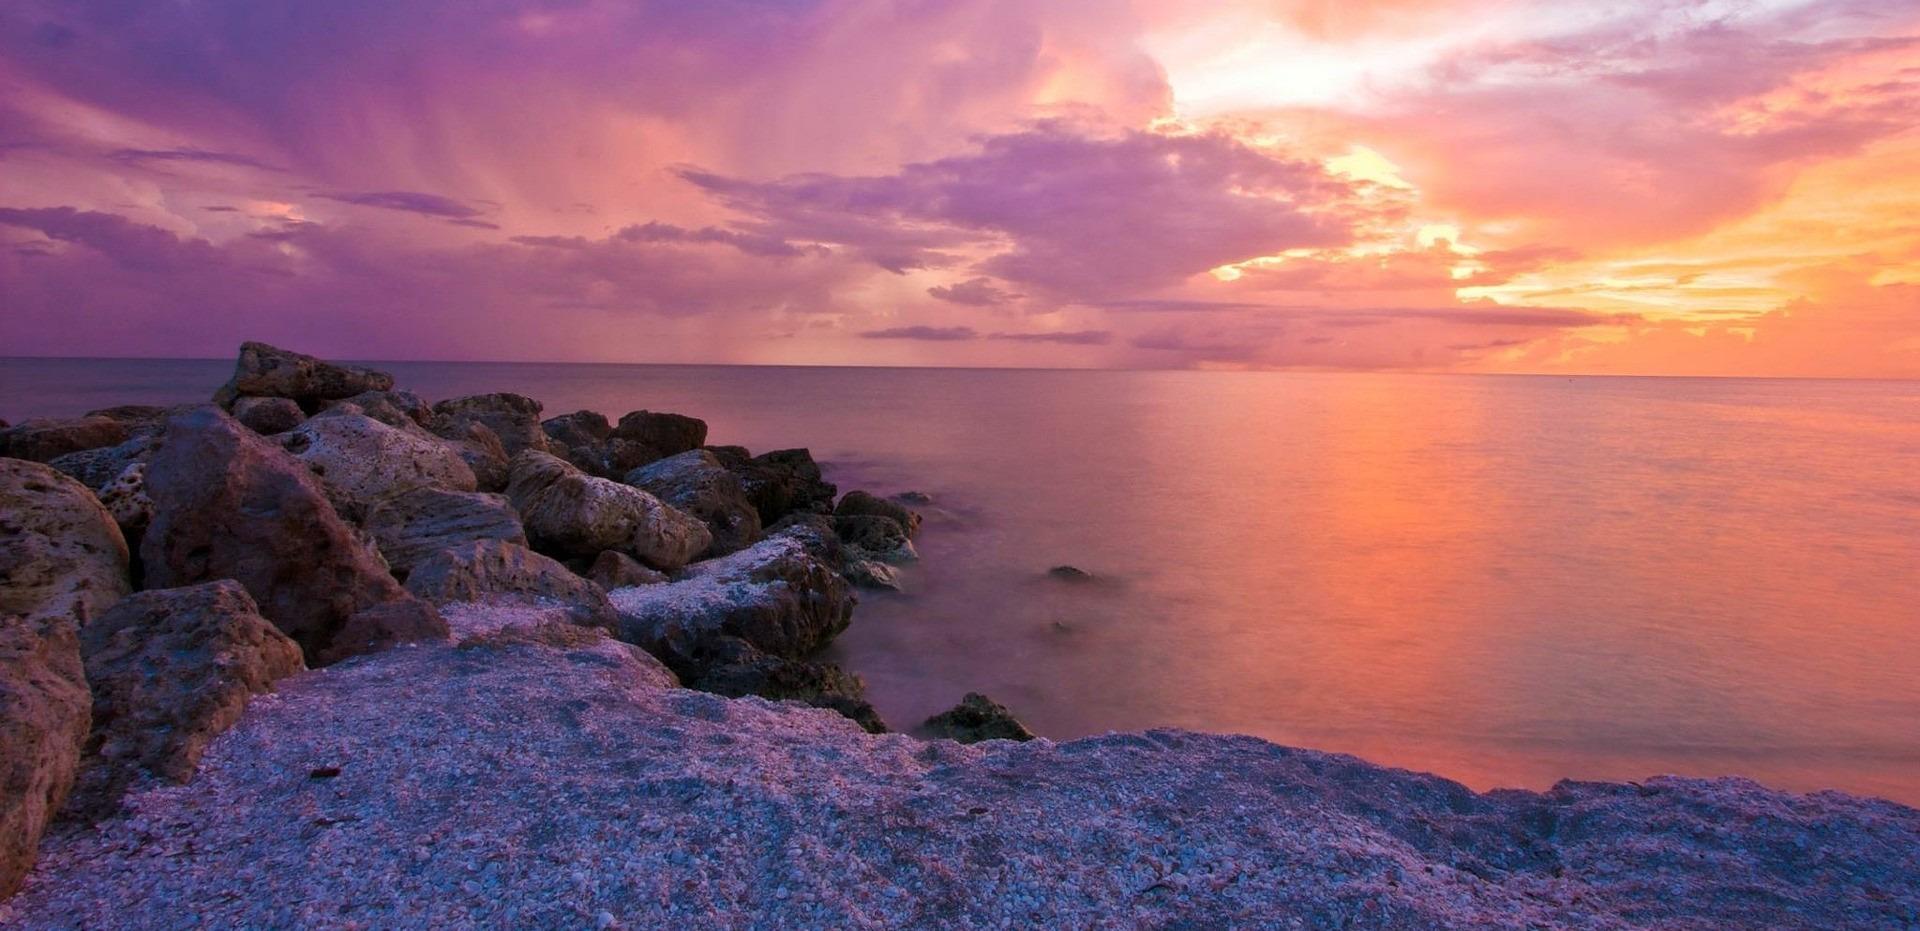 Sunset in Ellenton, Florida - GoodwillCarDonation.org